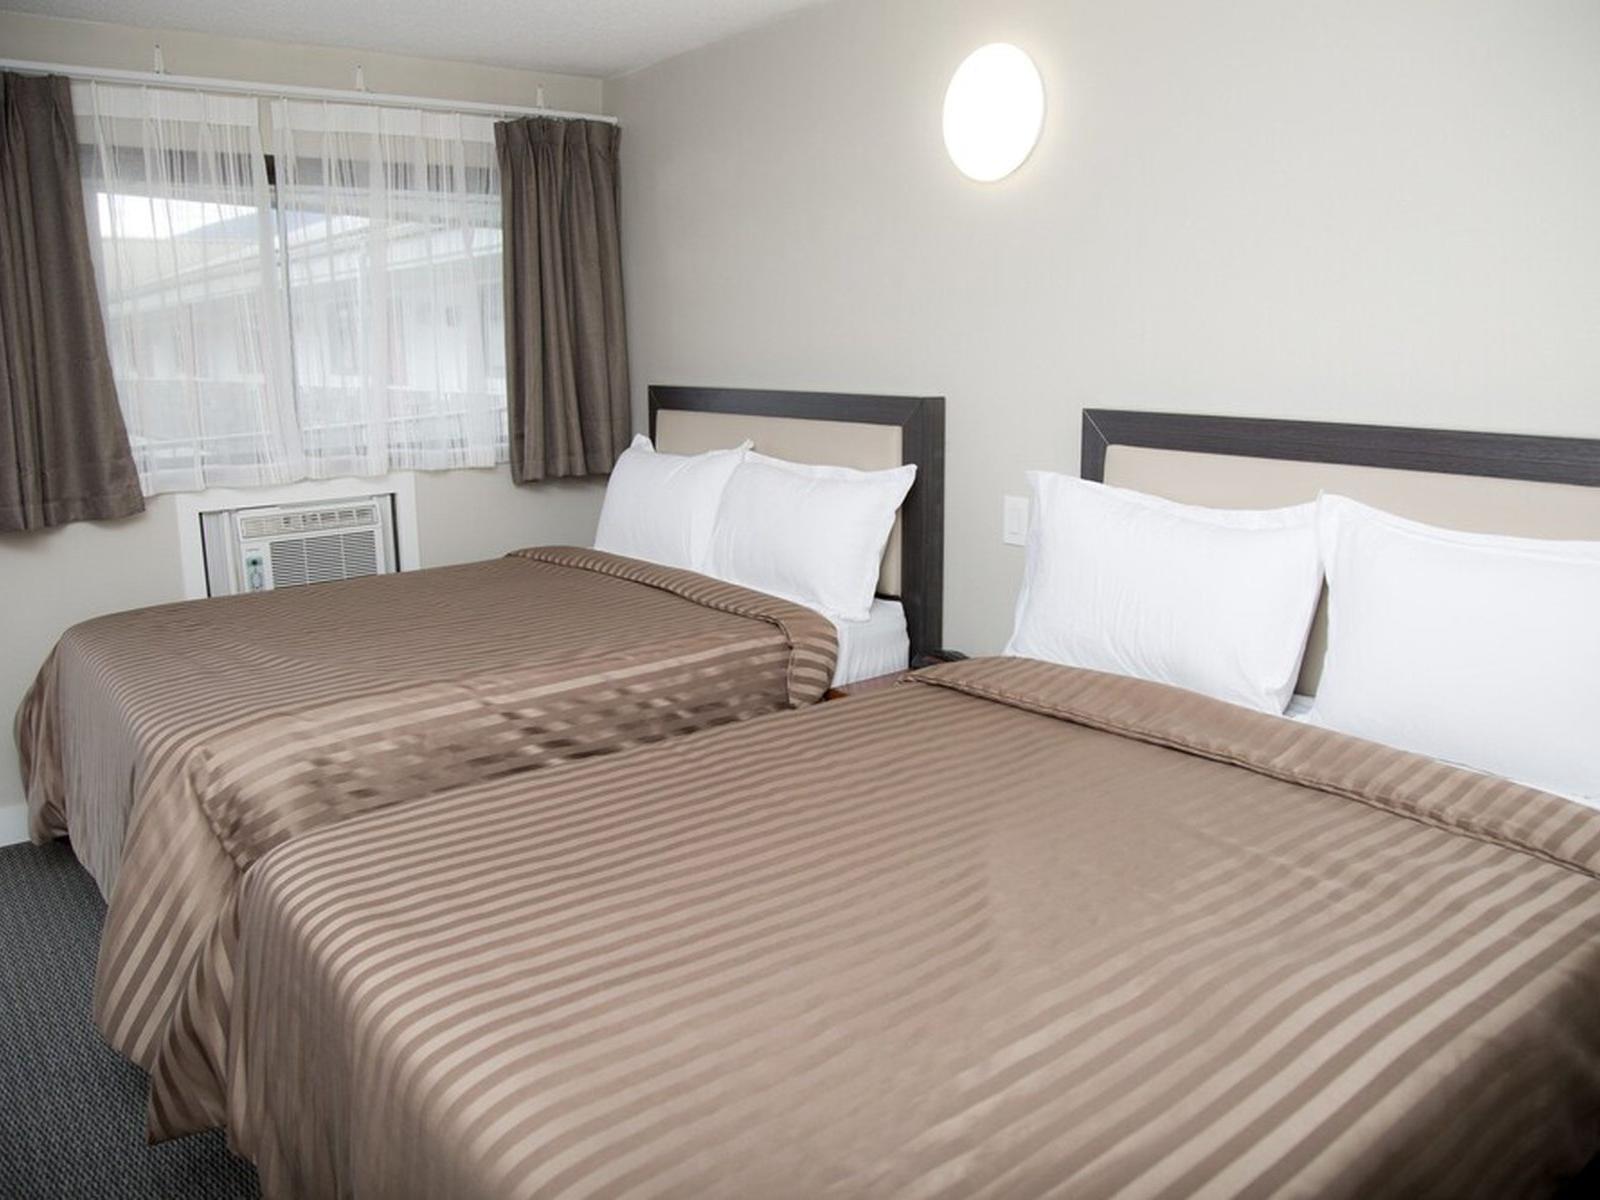 Standard 2 Double Bed Suites